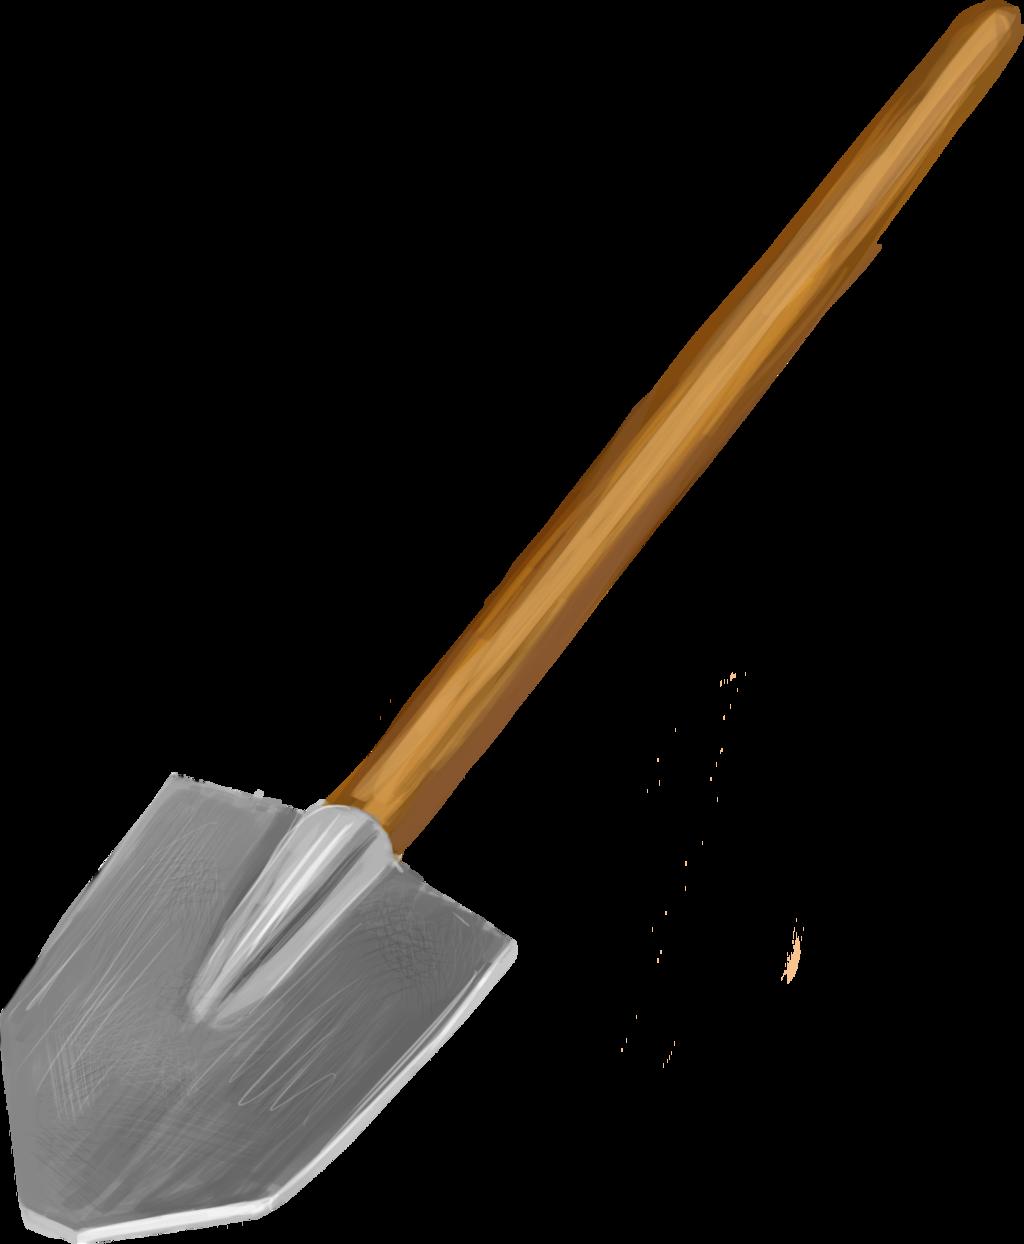 Excavator clipart shovel. Png images free download